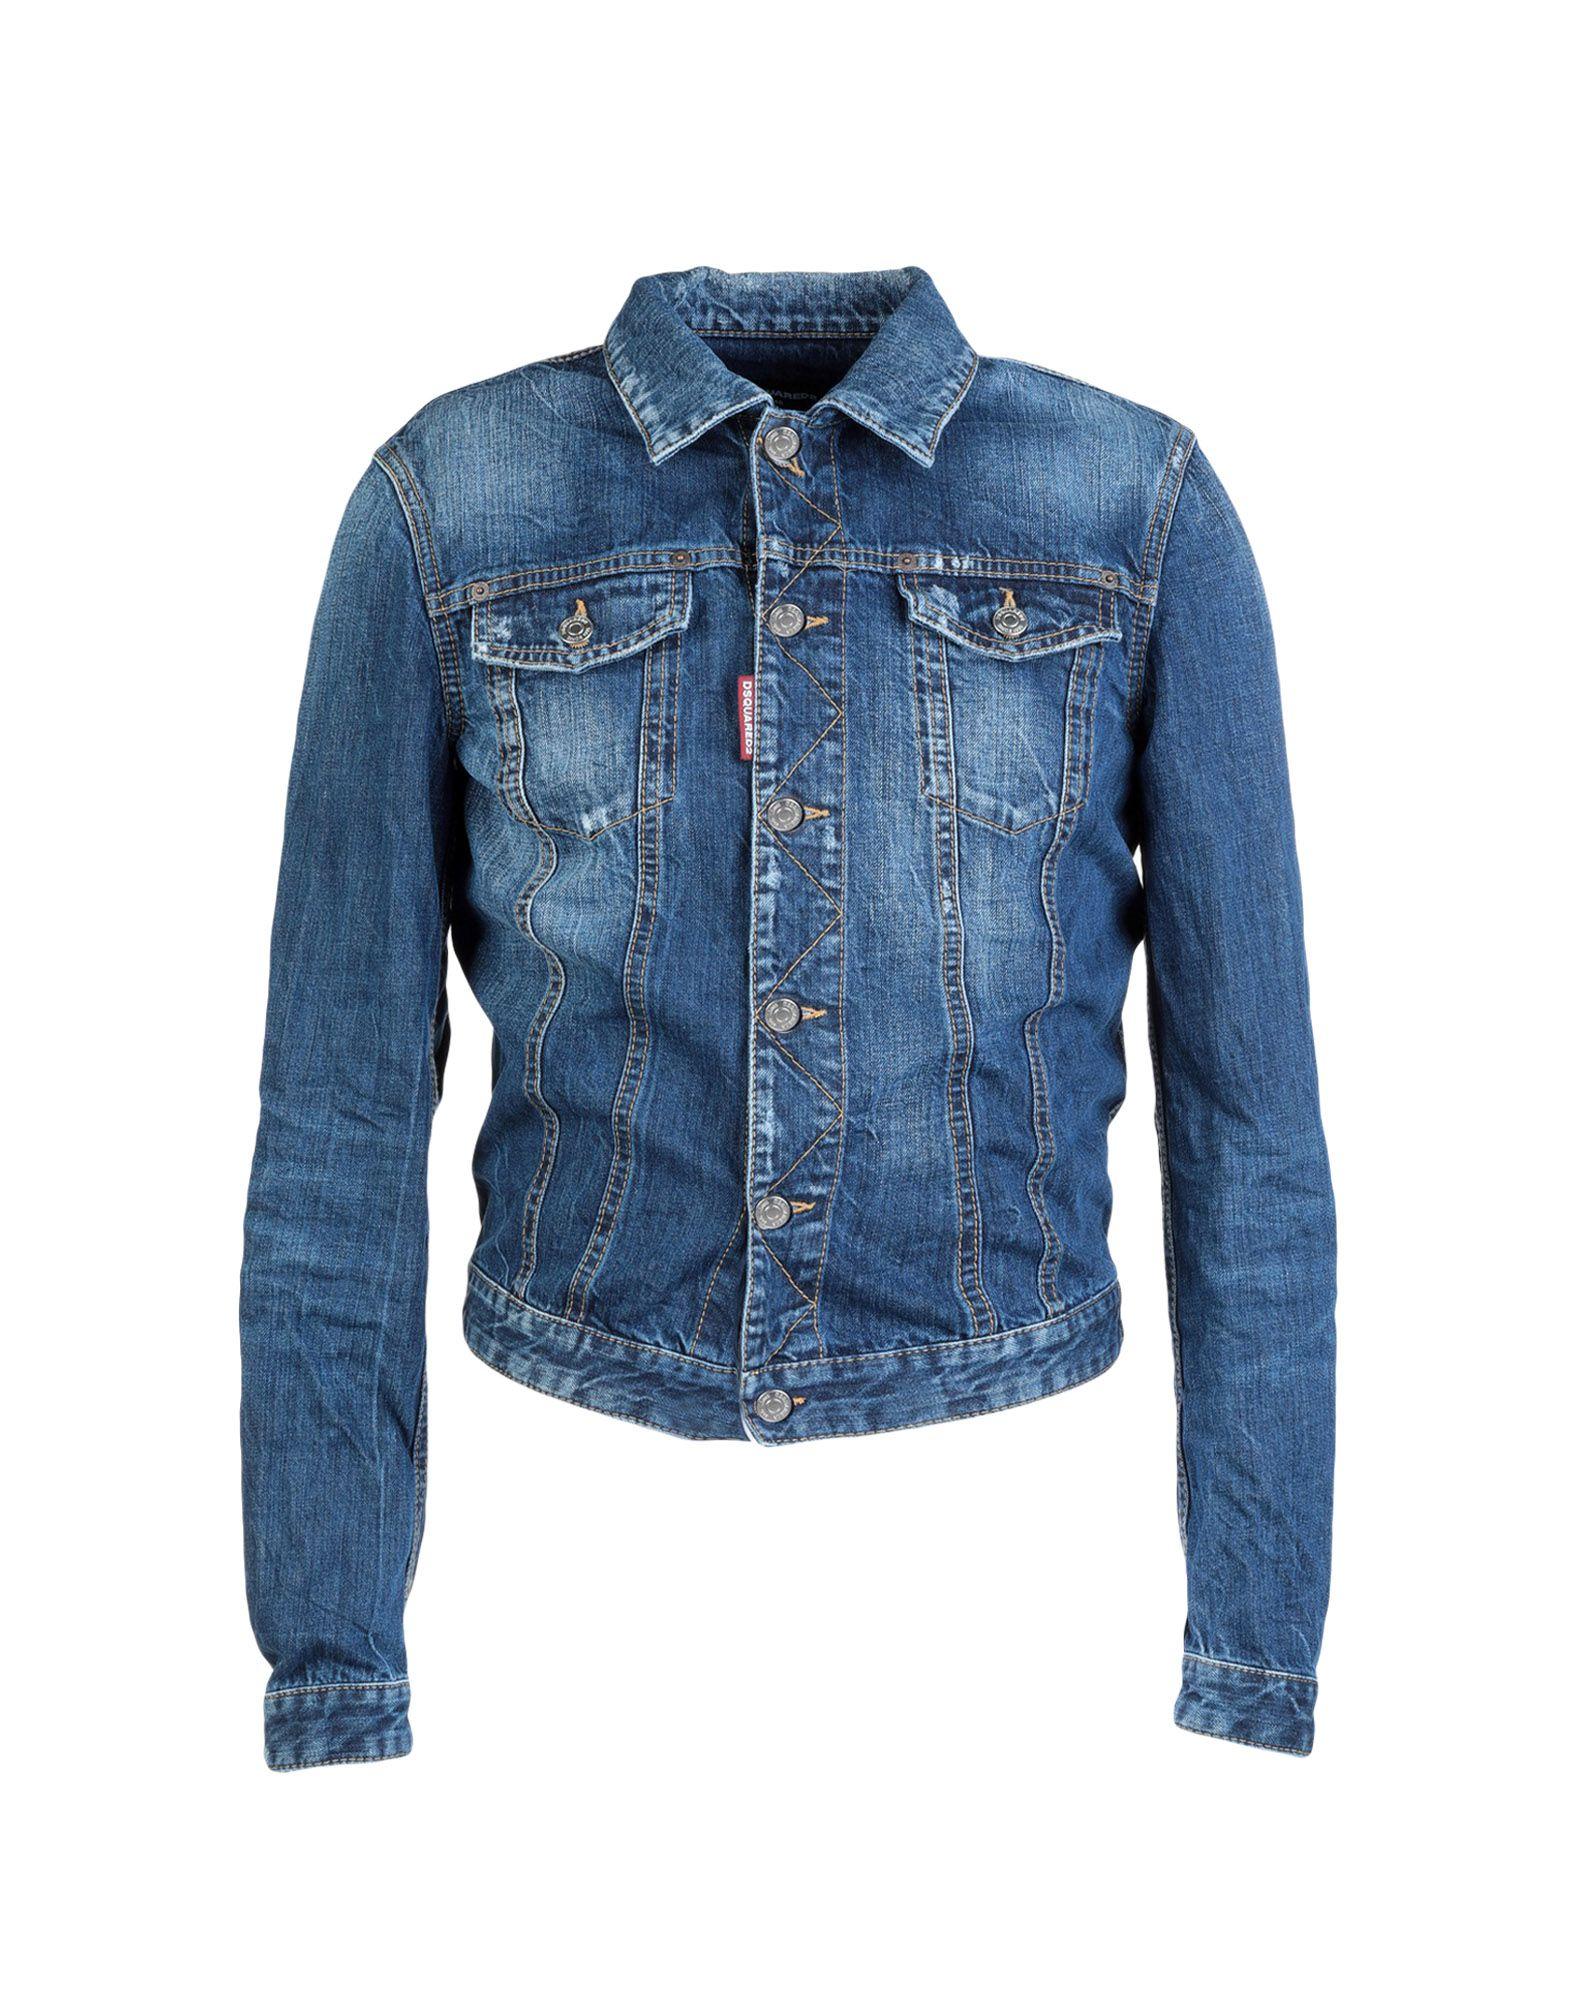 6384b3bf2727d3 Dsquared2 Denim Jacket - Men Dsquared2 Denim Jackets online on YOOX  Australia - 42695498FV